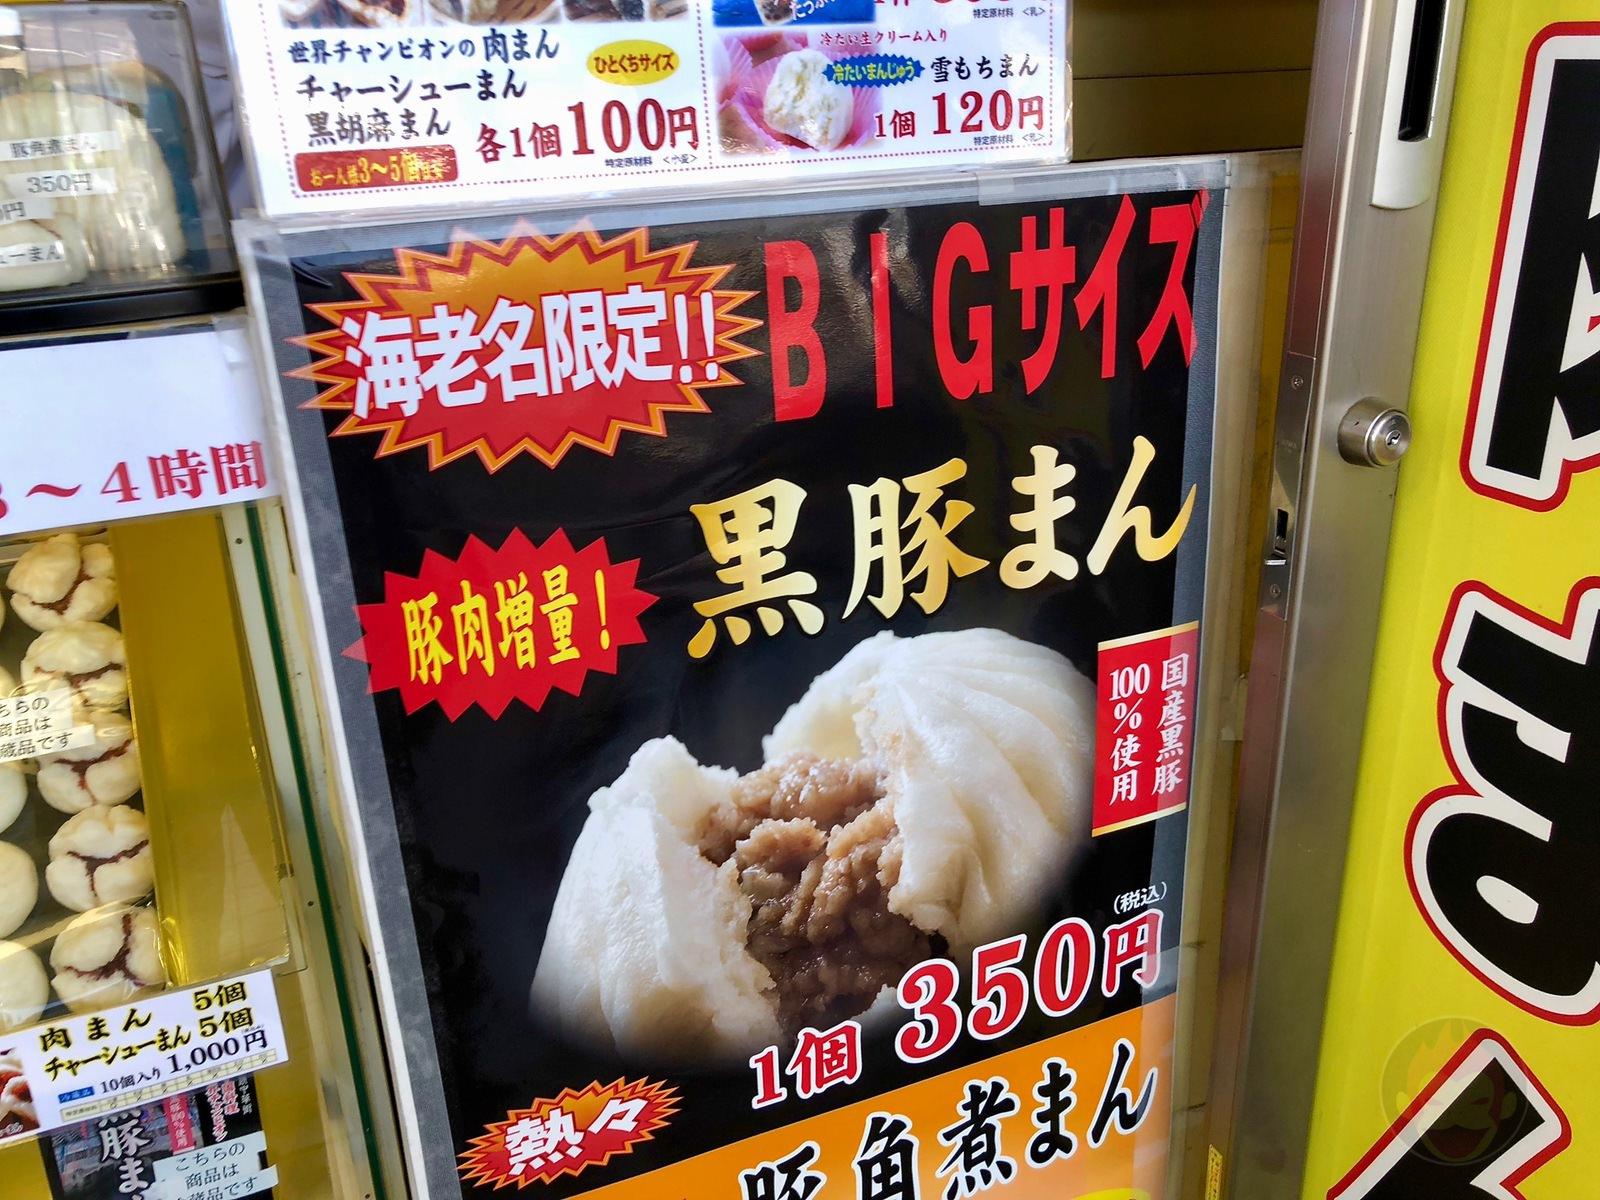 Kocho Giant Nikuman Ebina Service Area 01